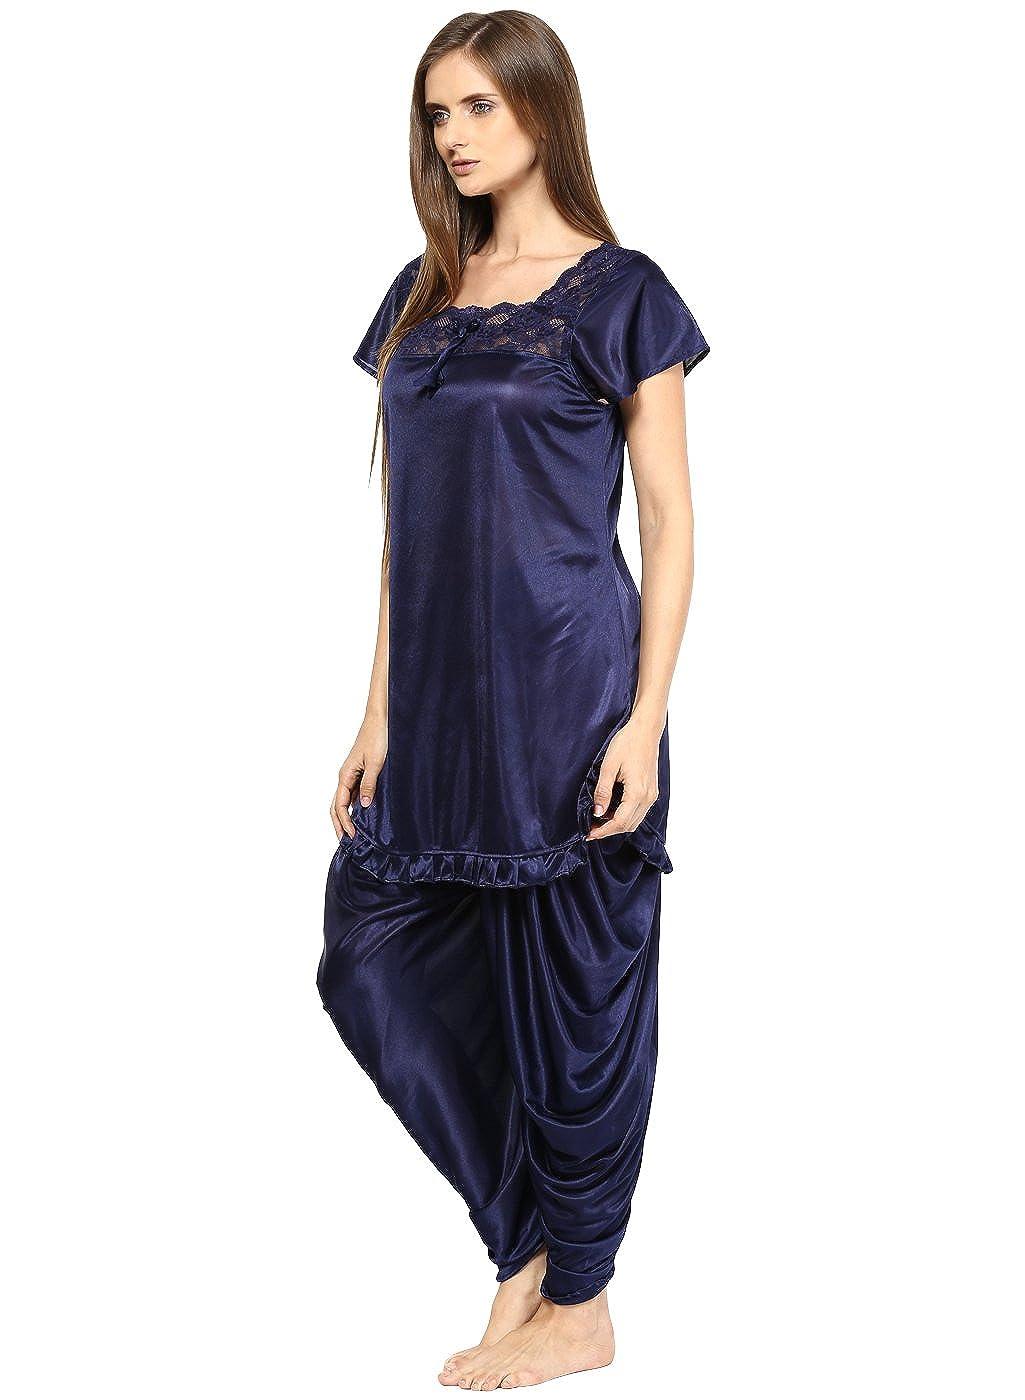 Fashigo Women s Nightdress (Set)(FASNW038 Blue Free Size)  Amazon.in   Clothing   Accessories 921d5160a